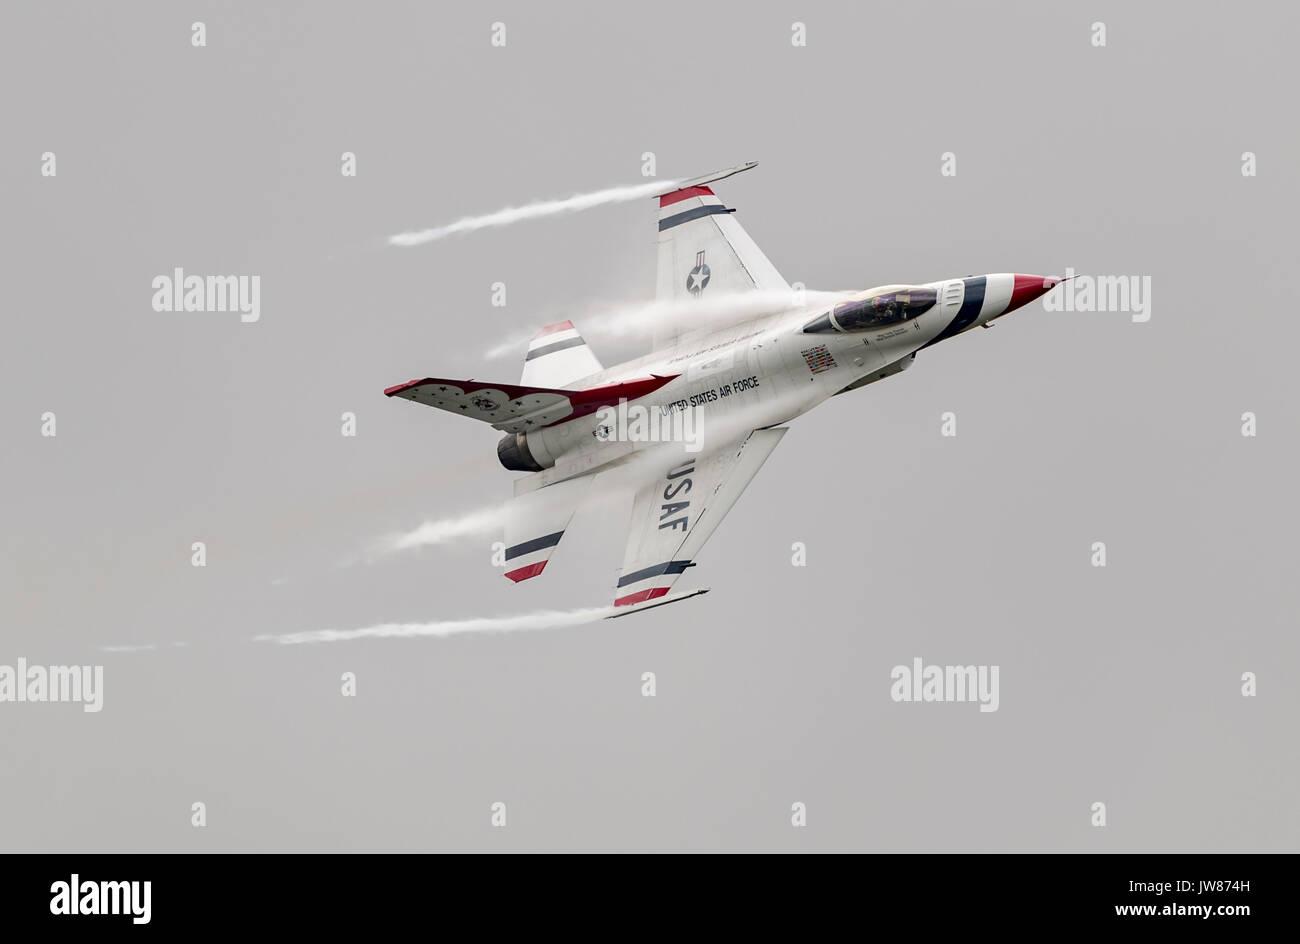 Thunderbirds Aerobatic Display Team, USAF - Stock Image